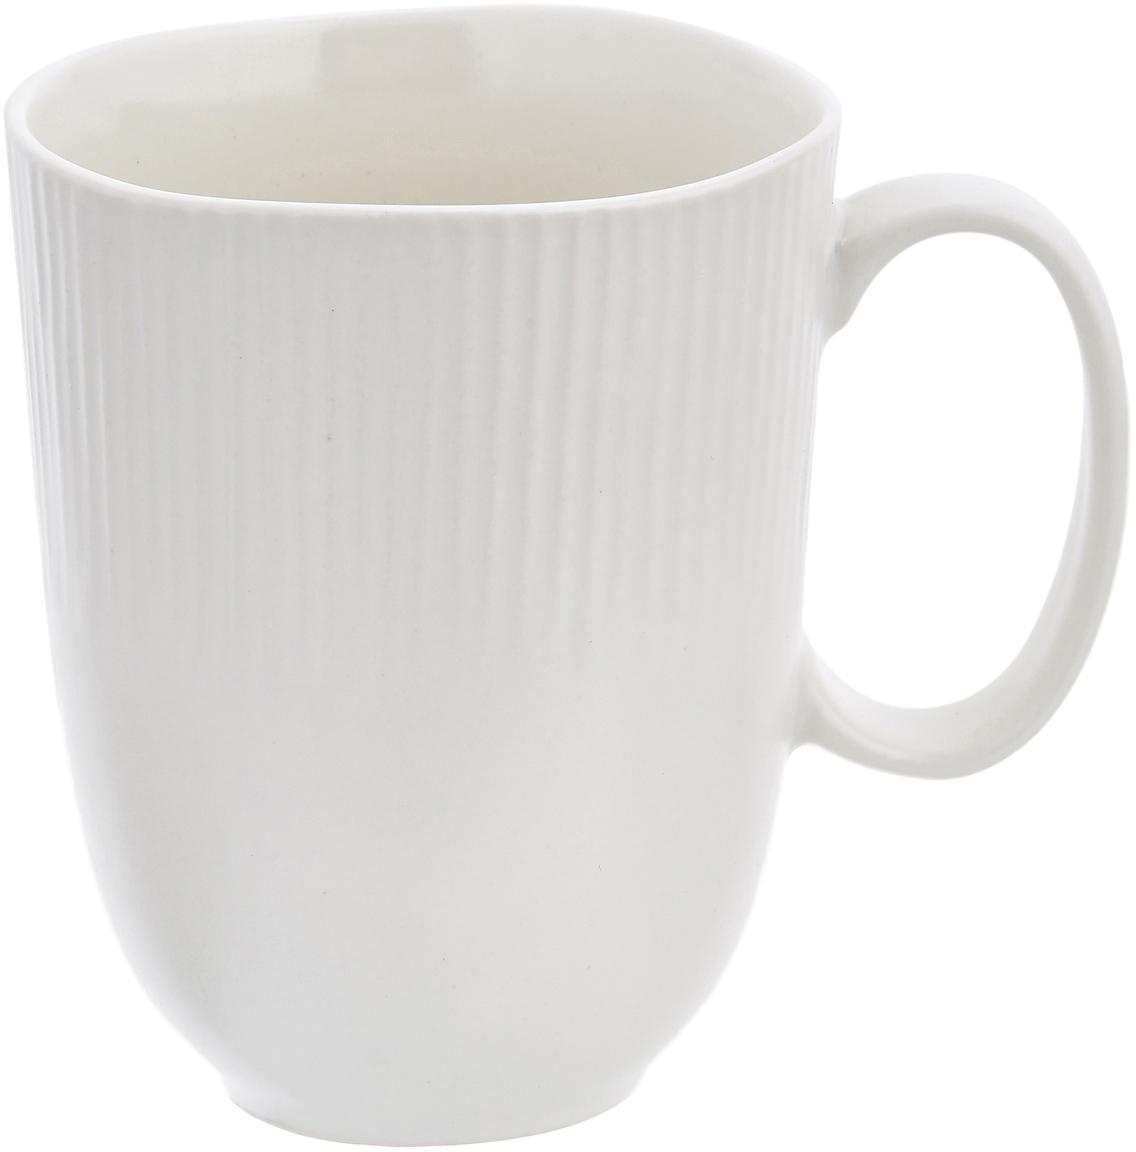 Tazza in terracotta fatta a mano Sandvig 4 pz, Porcellana, tinta, Bianco latteo, Ø 8 x Alt. 10 cm